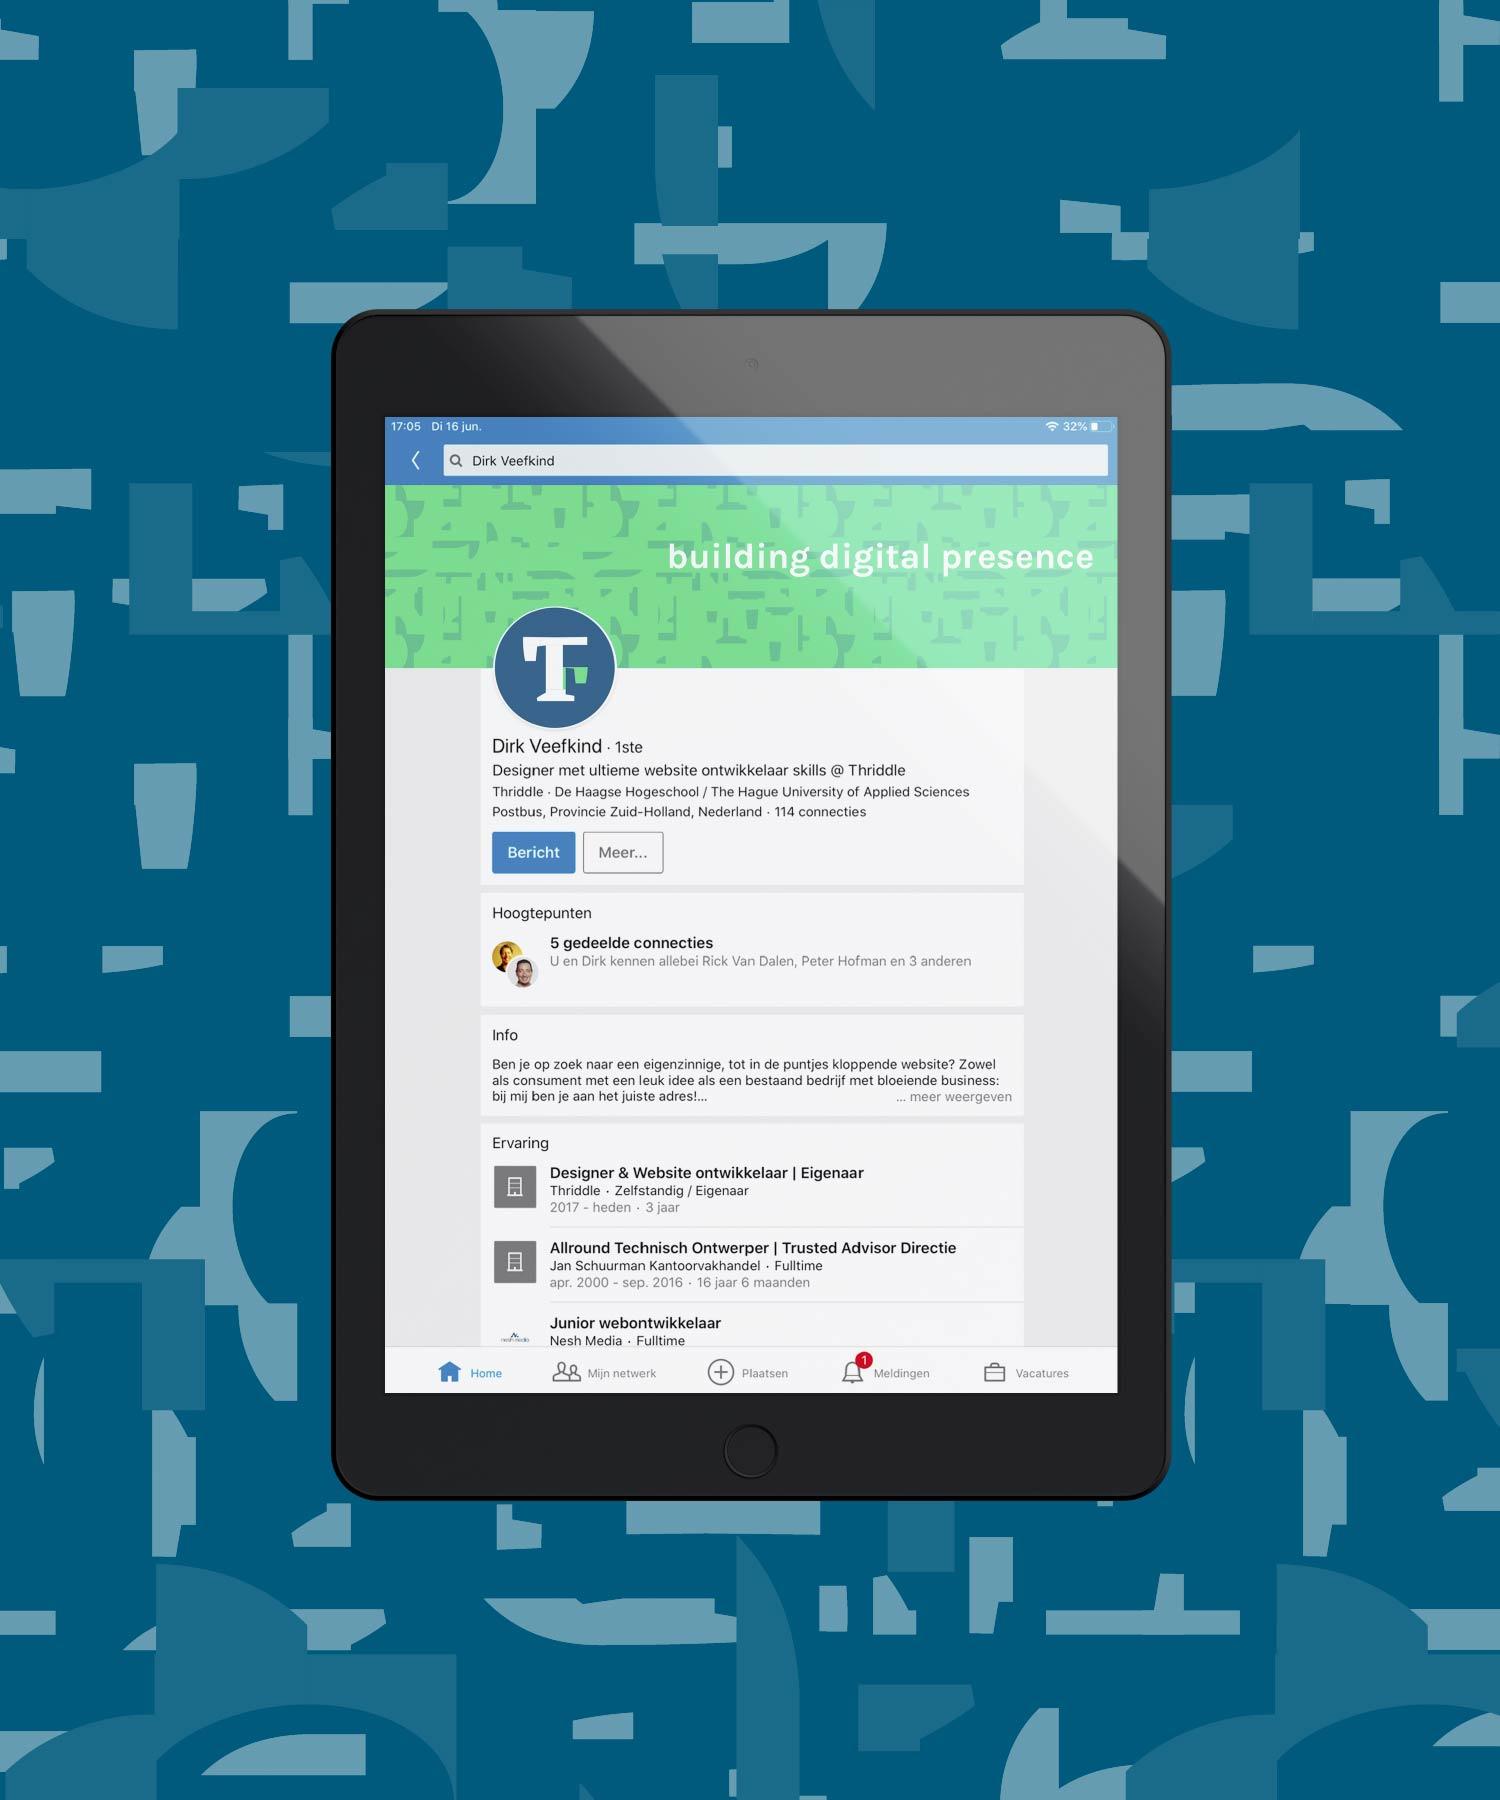 Thriddle socialmedia M-space